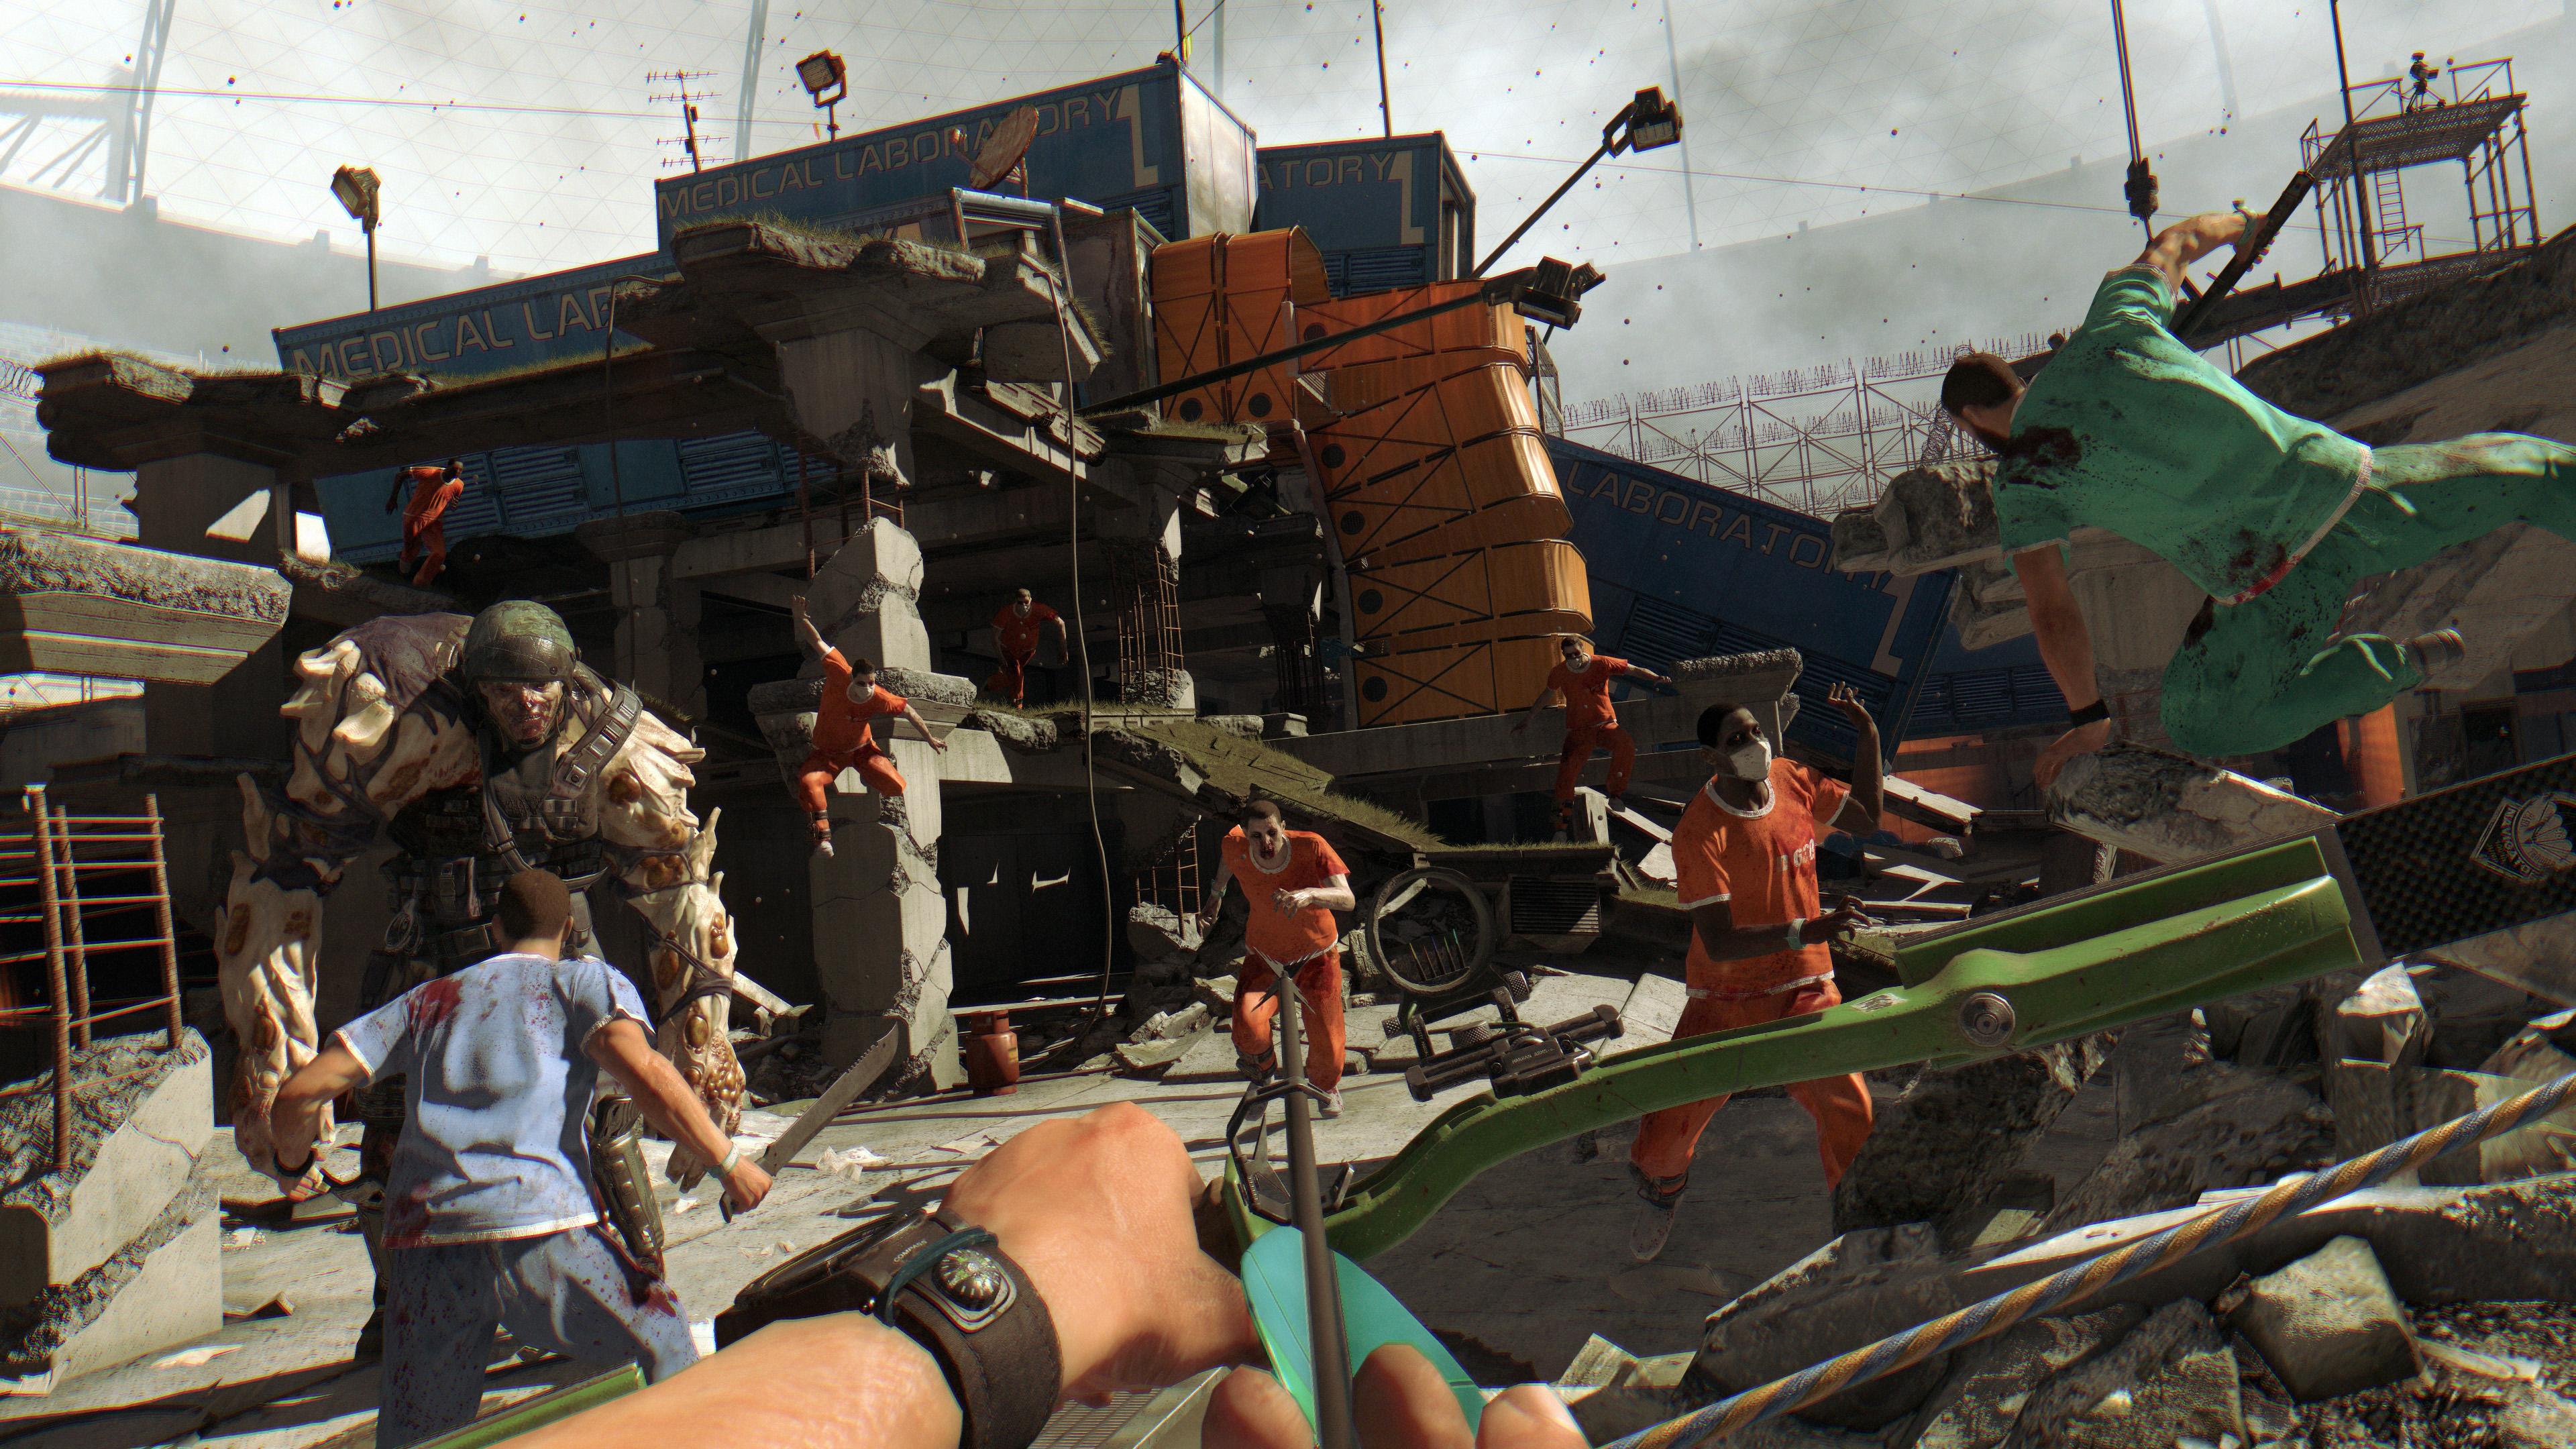 Dying Light: The Bozak Horde game image